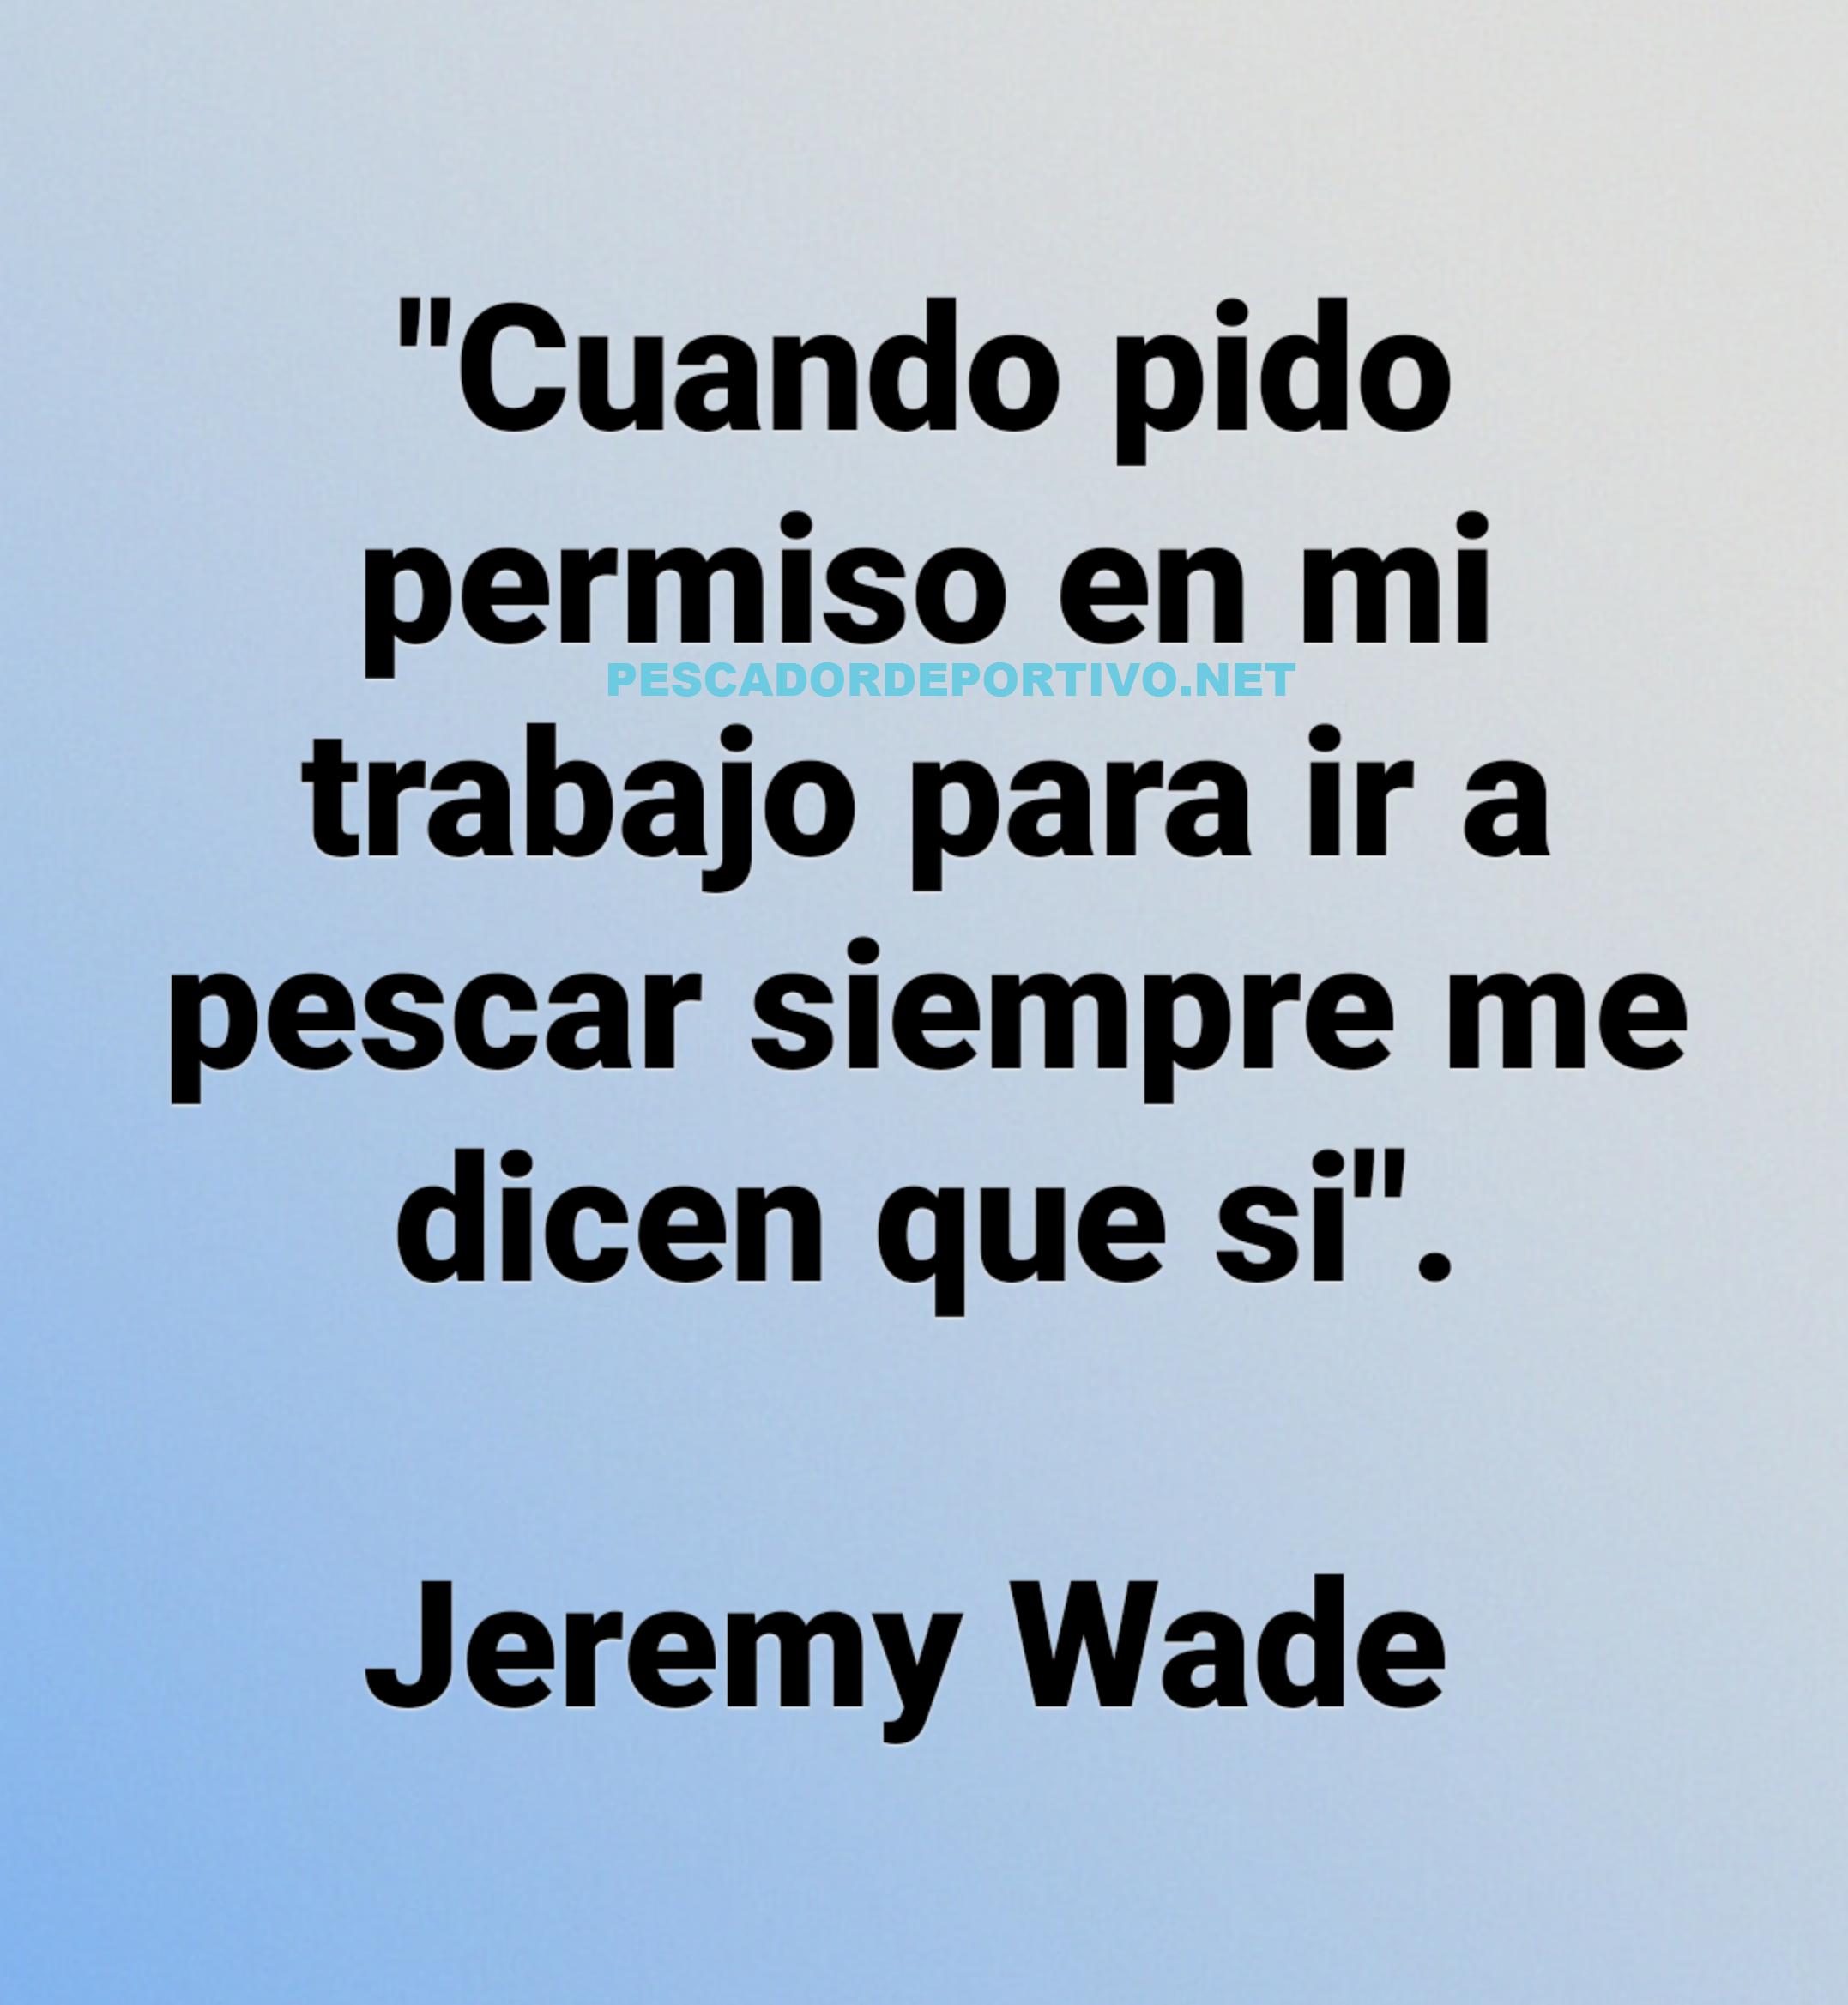 Meme Jeremy Wade 7